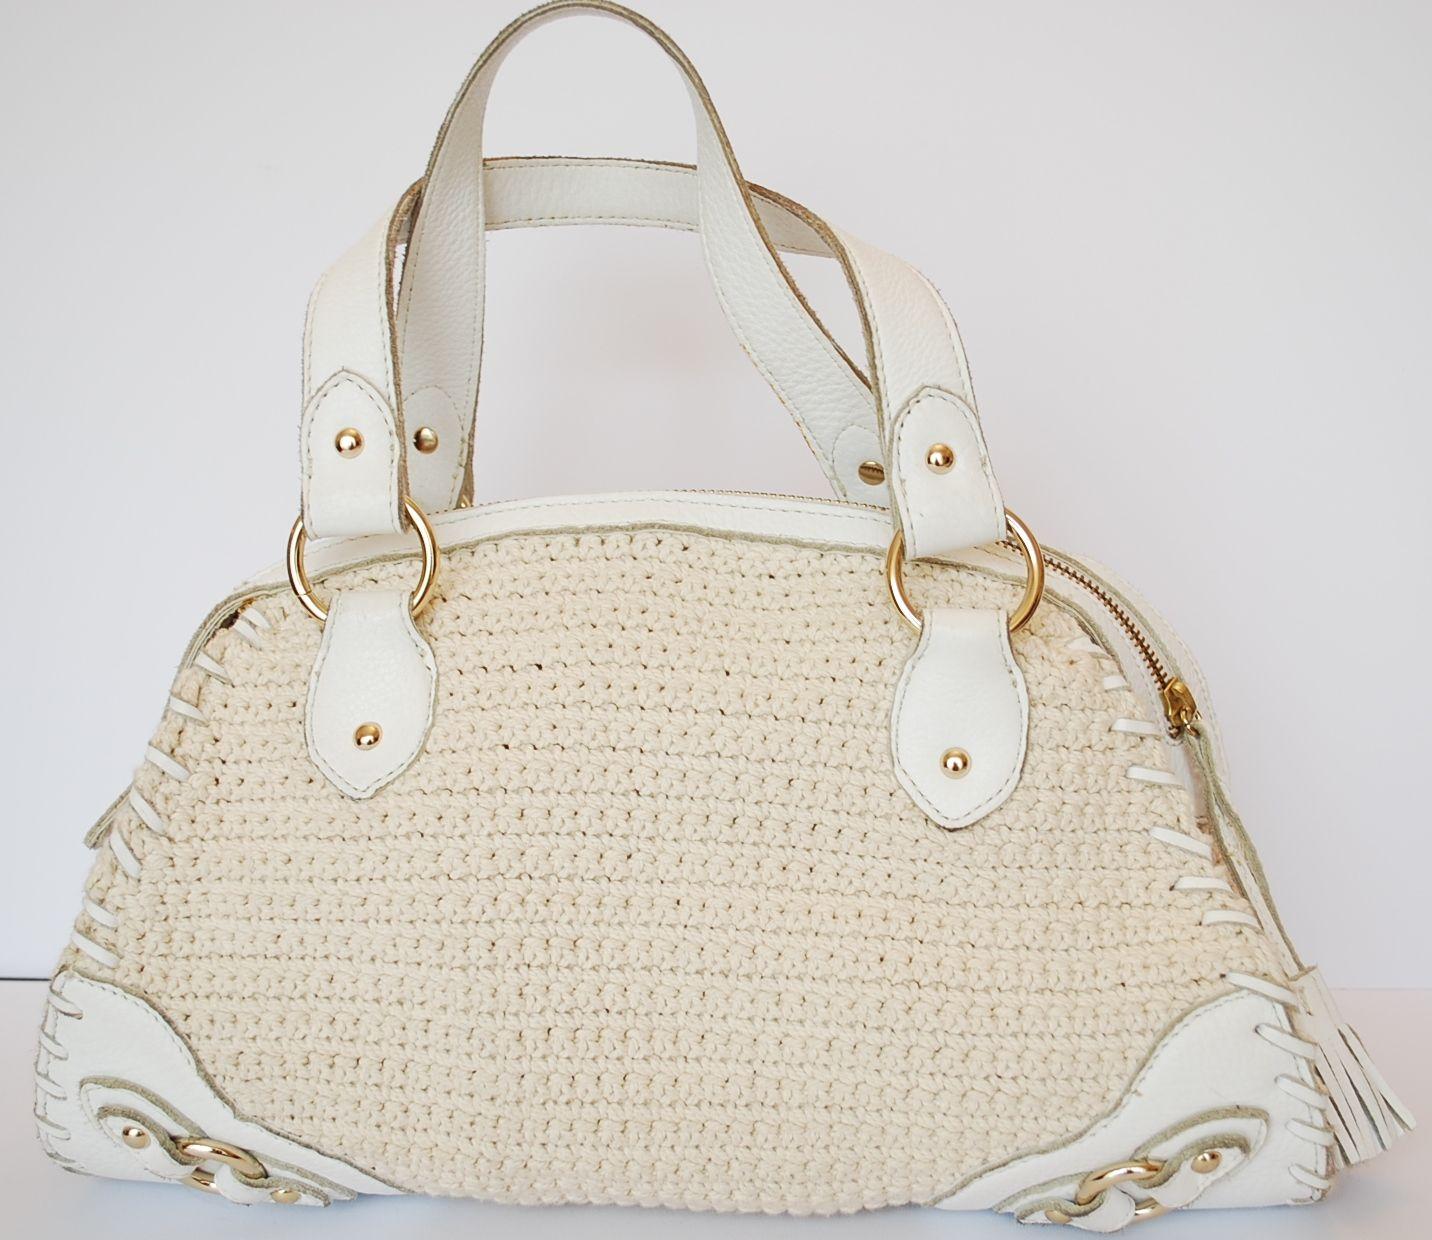 80b7447a2122 White leather and cream crochet 'The SAK' handbag | the sak crochet